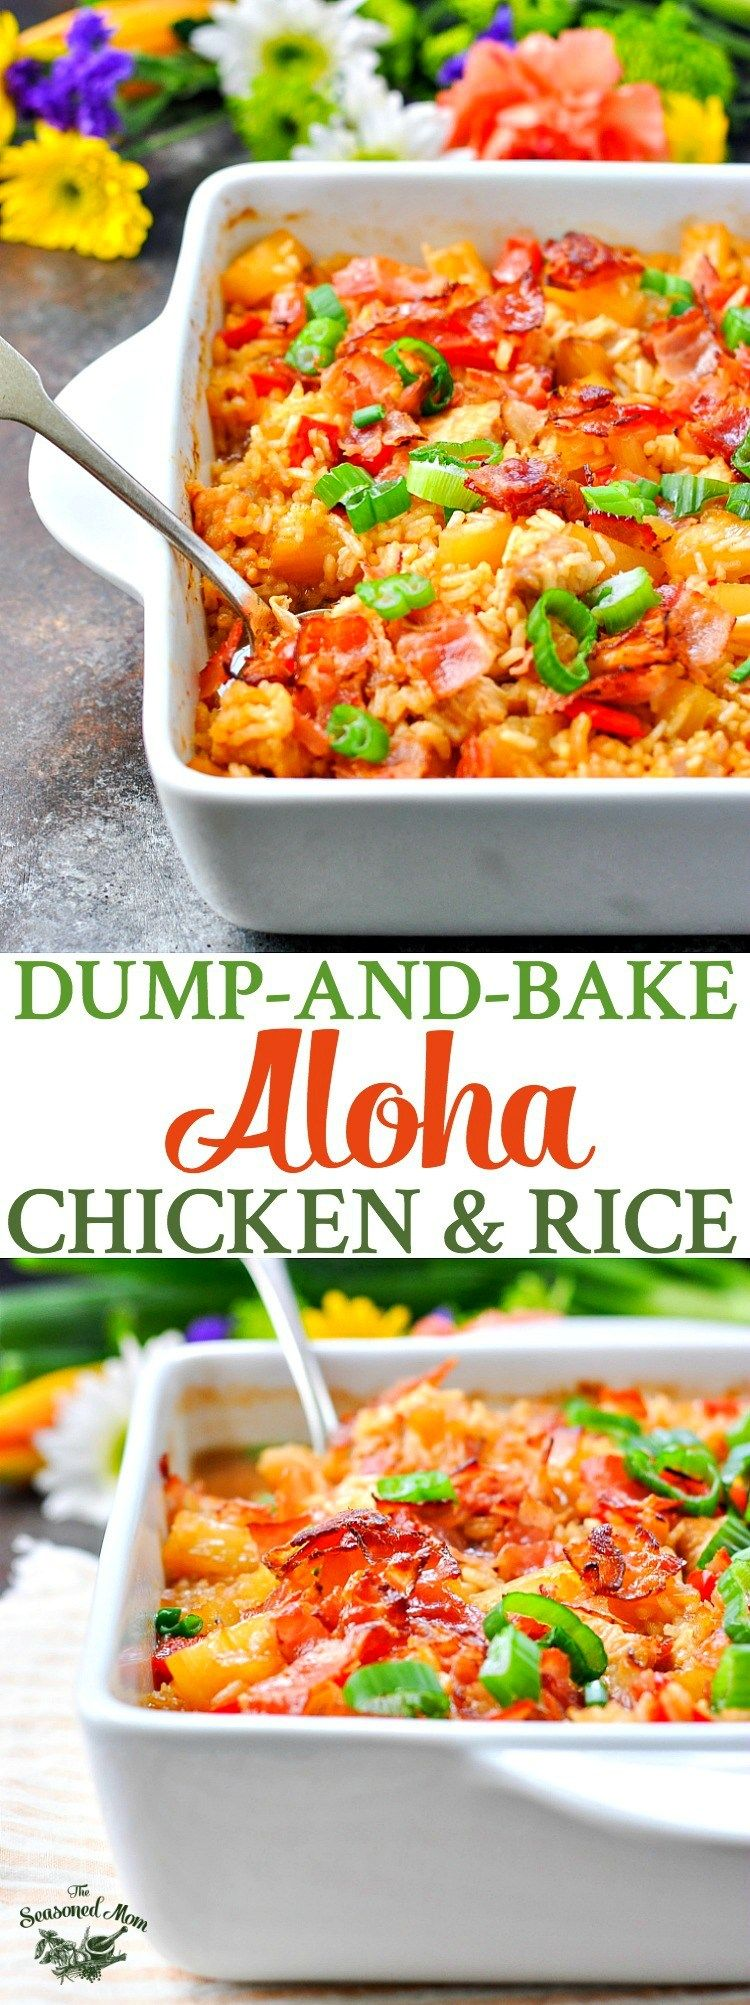 Dump-and-Bake Aloha Chicken and Rice